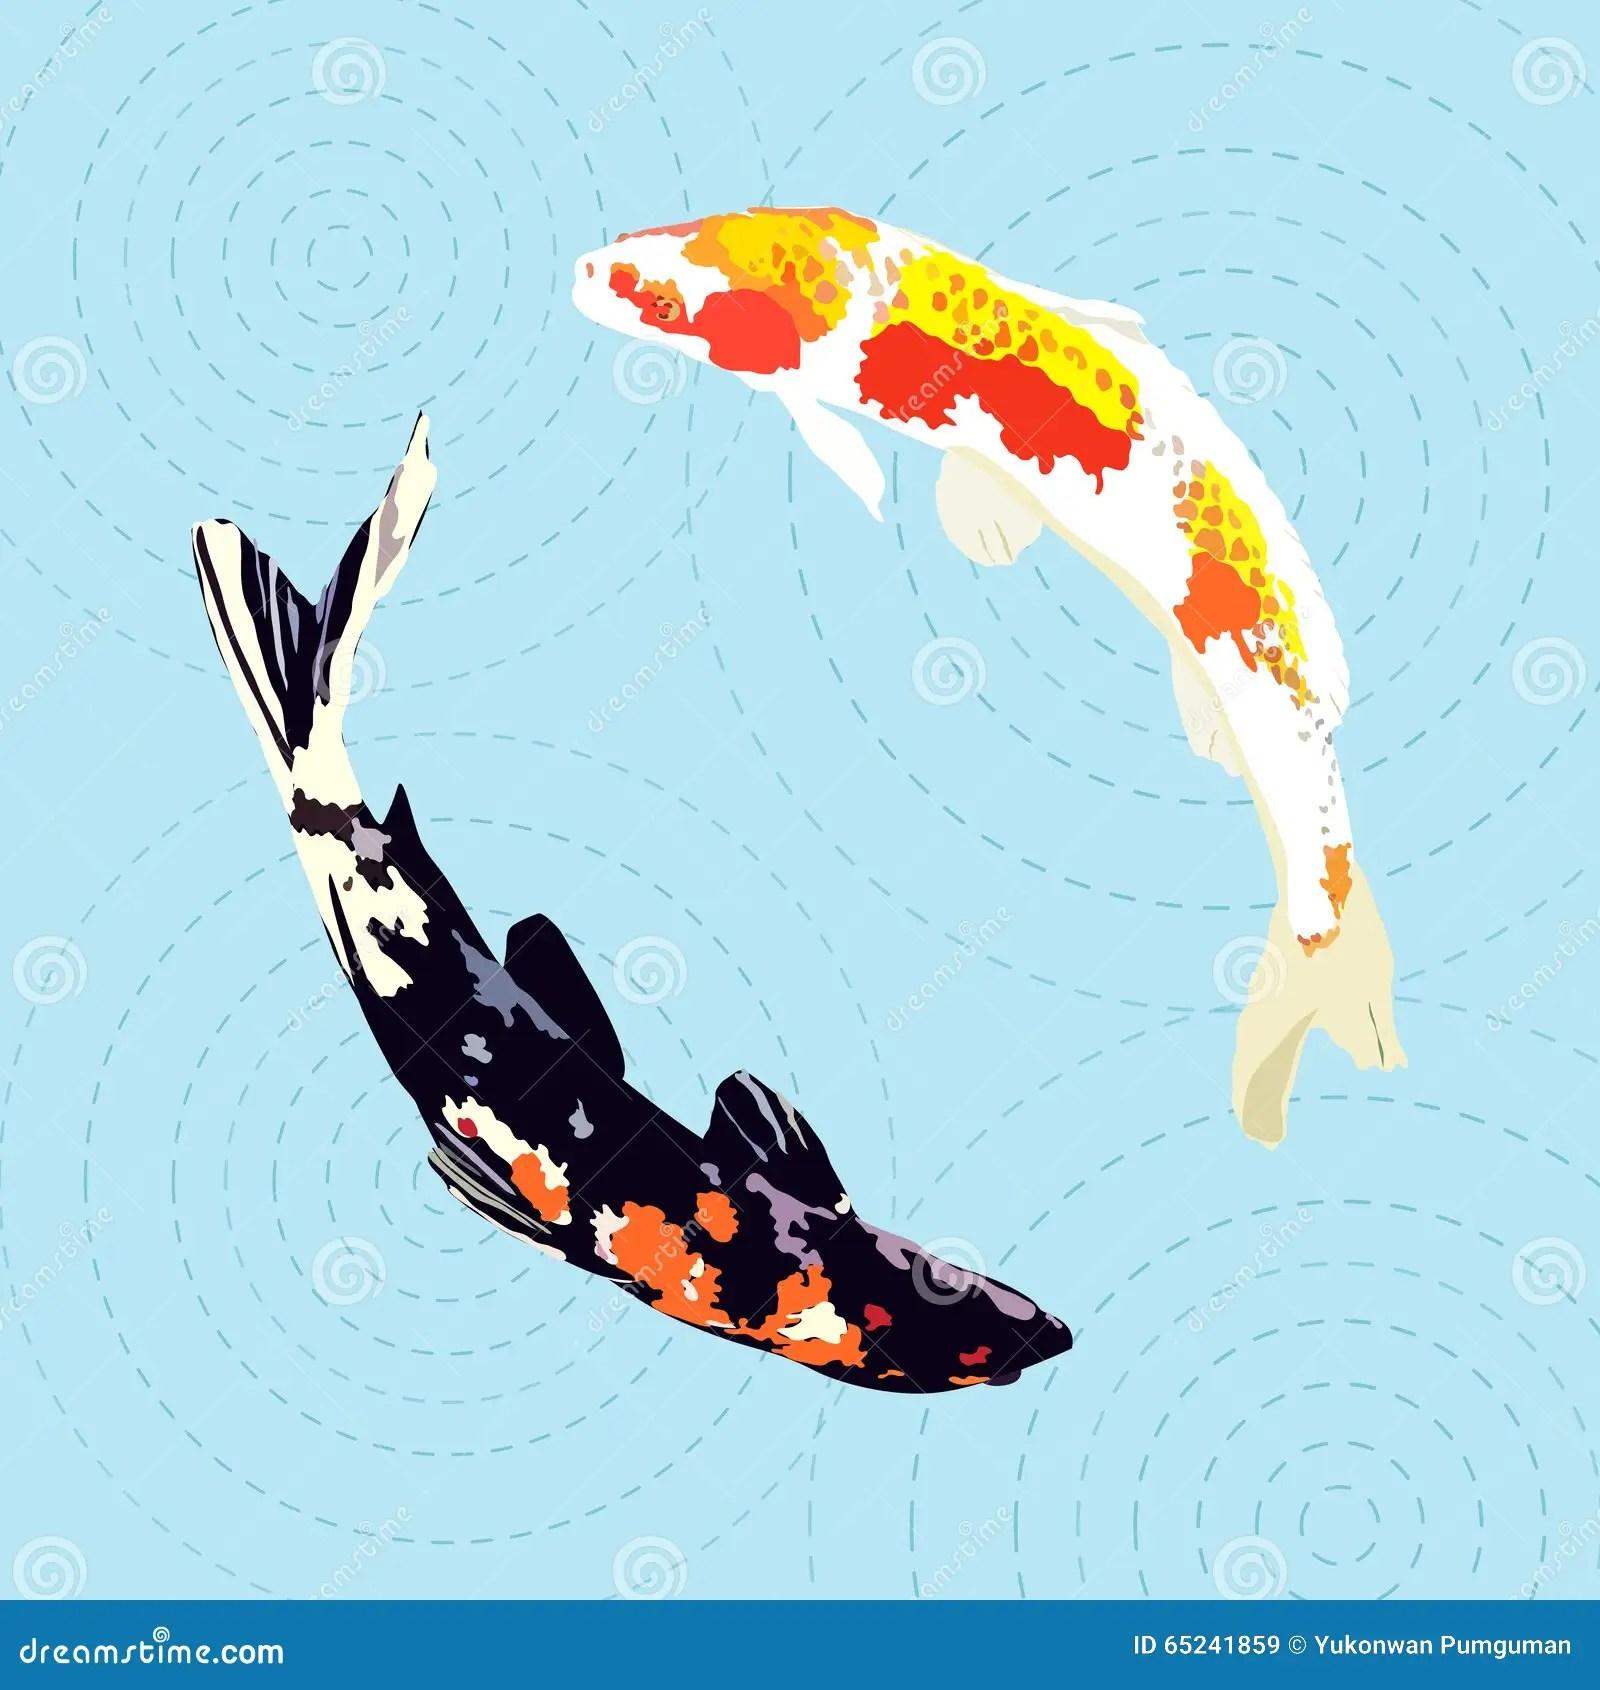 Koi Fish 3d Wallpaper Free Download Chinese Carp Japanese Koi Fish Vector Illustration Stock